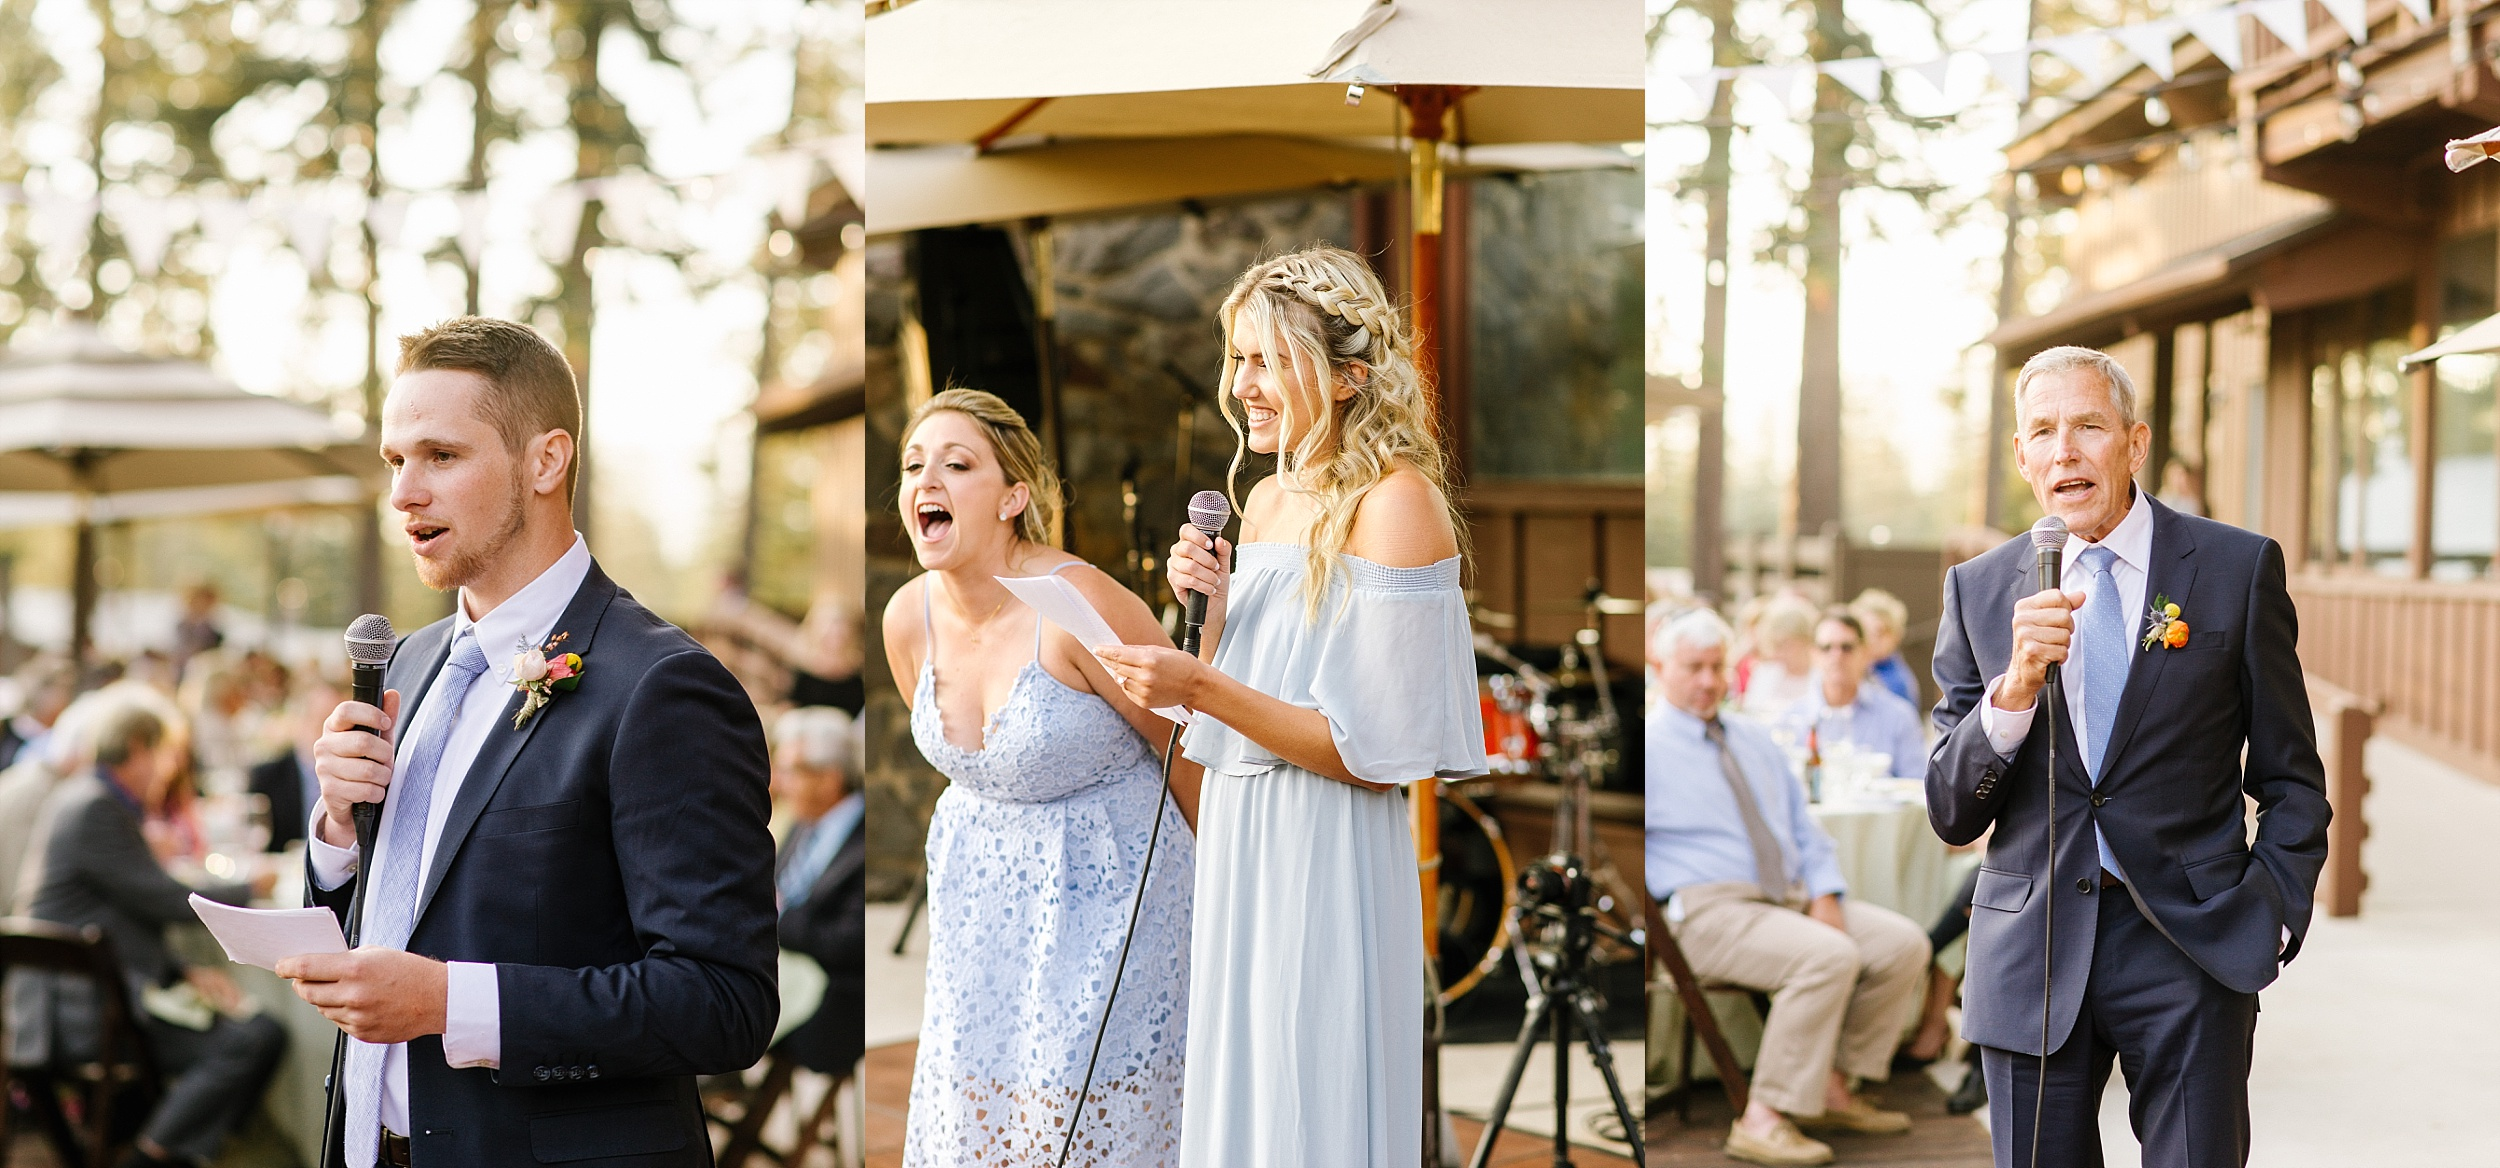 Sugar-Bowl-tahoe-wedding-sallyjohn_chelsea-dier-photography_0029.jpg